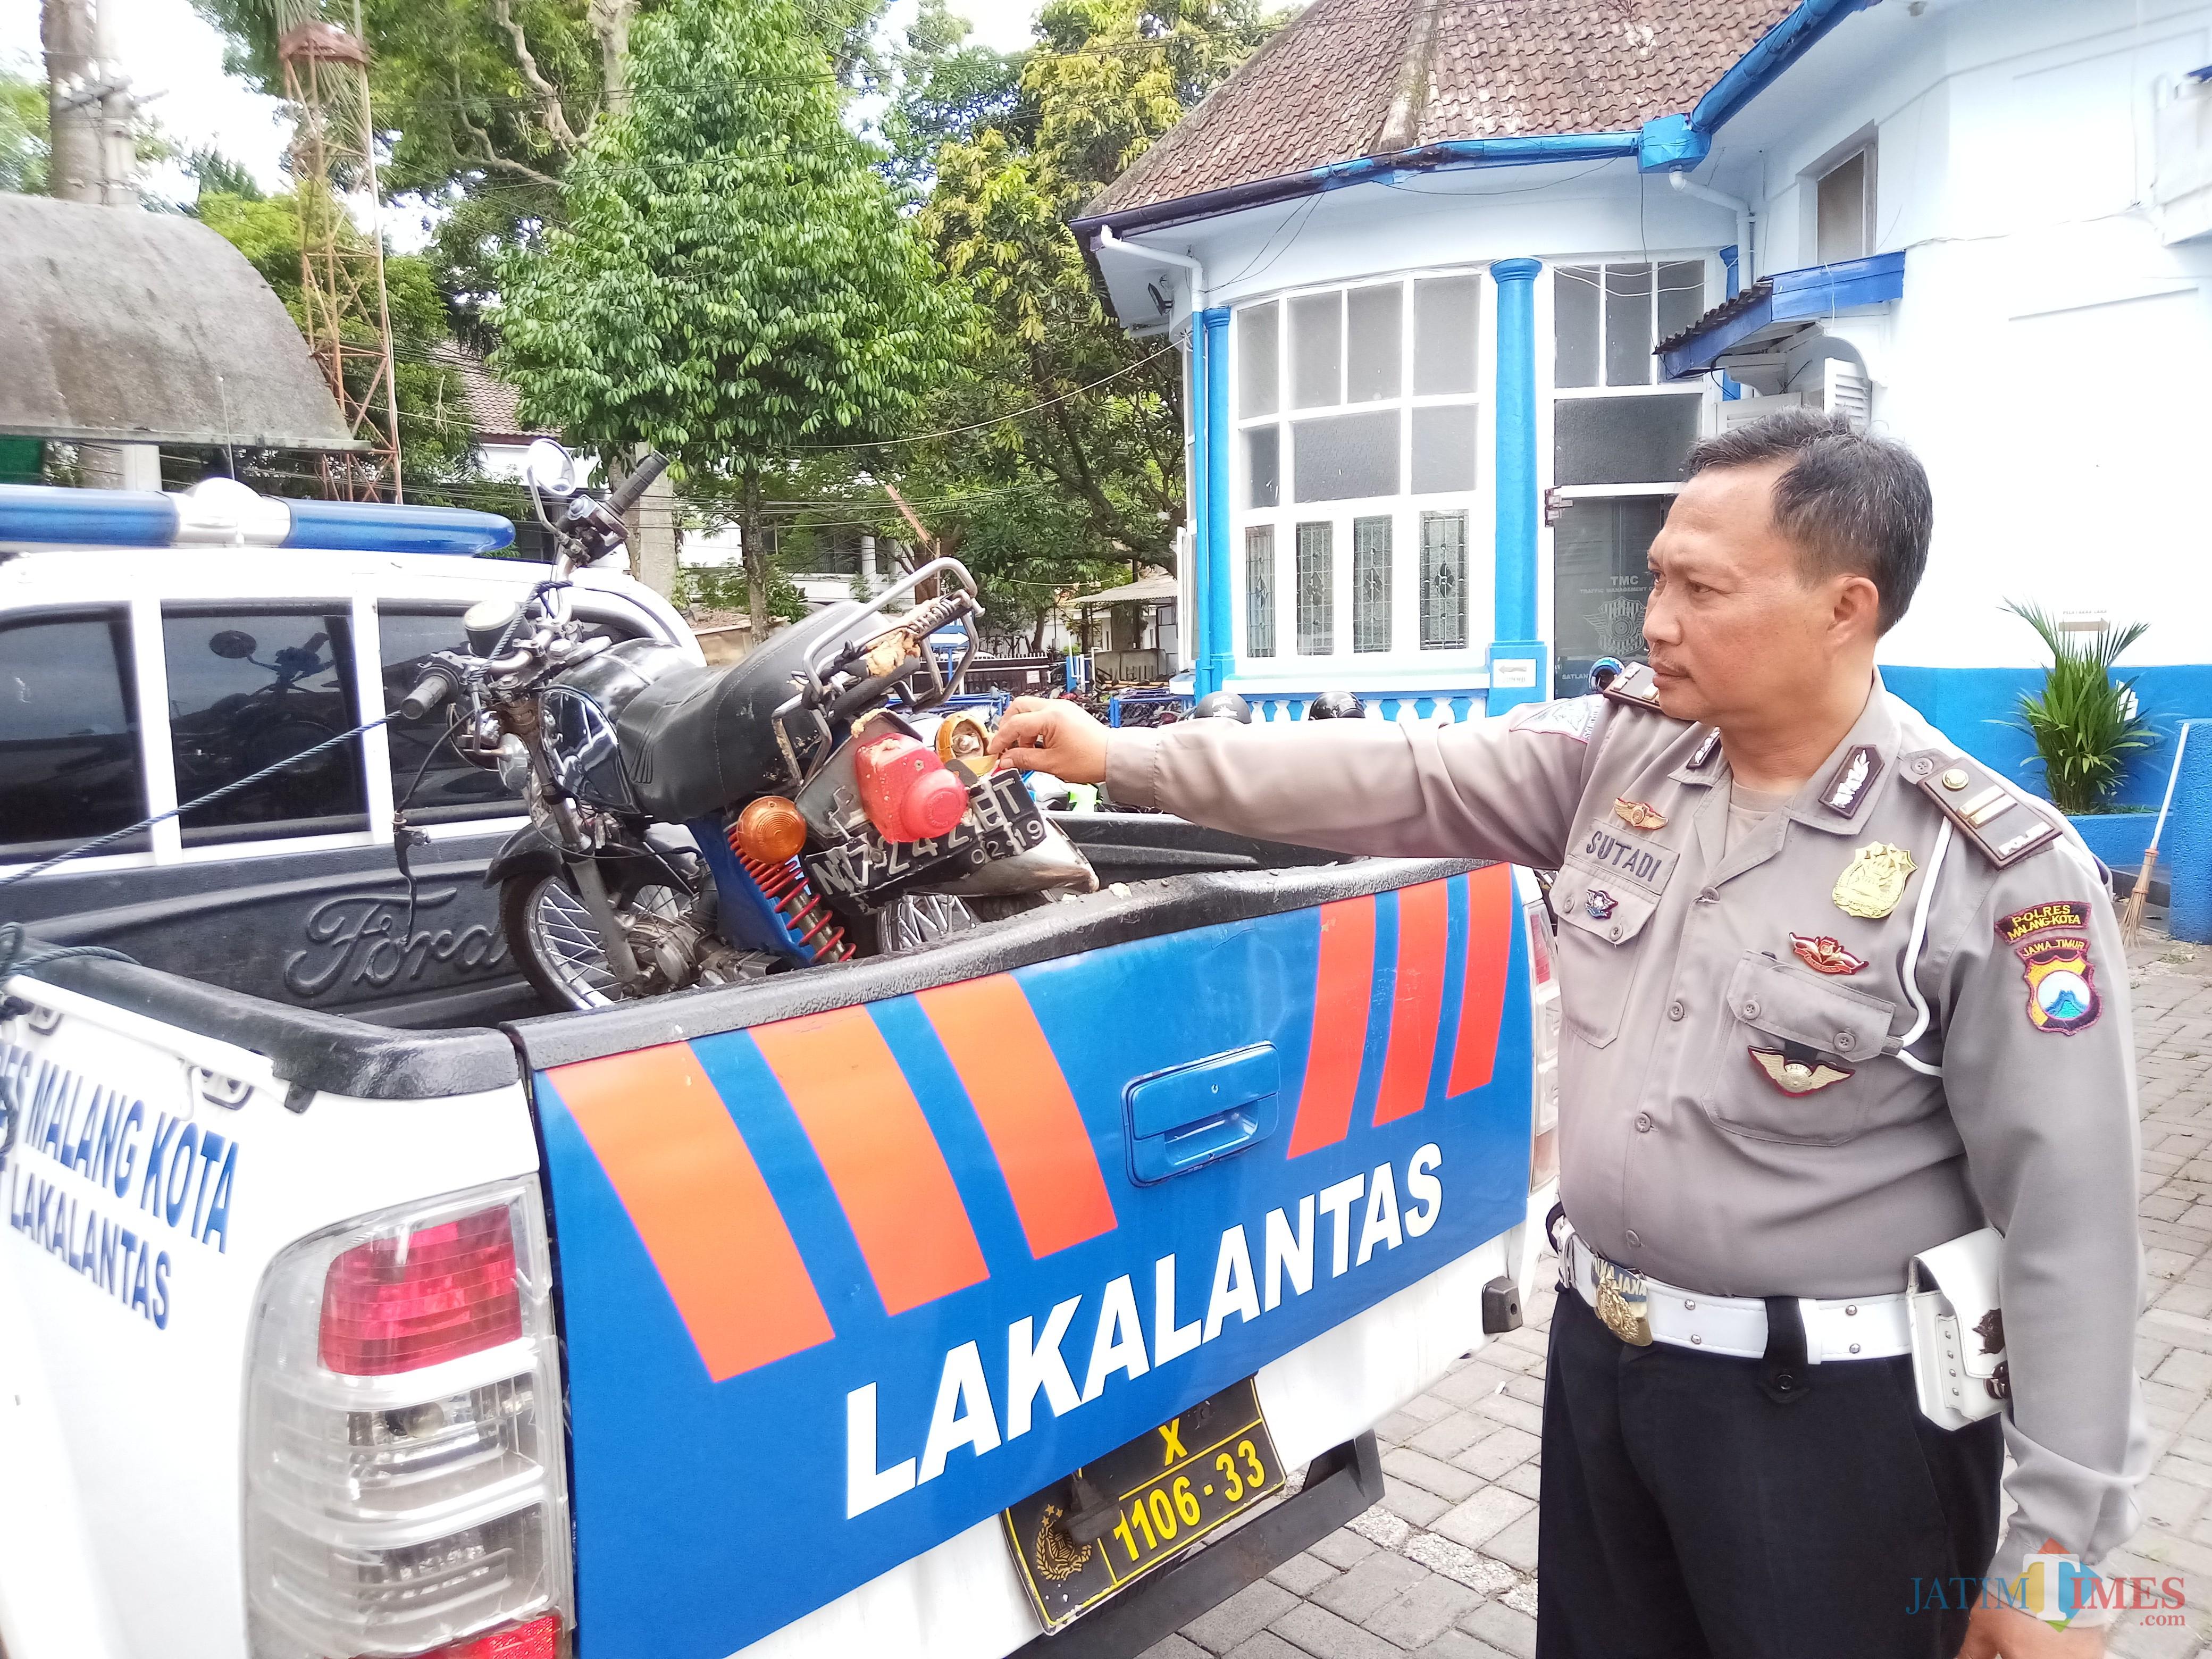 Sepeda motor korban yang diamankan di Unit Laka Polres Malang Kota (Anggara Sudiongko/MalangTIMES)